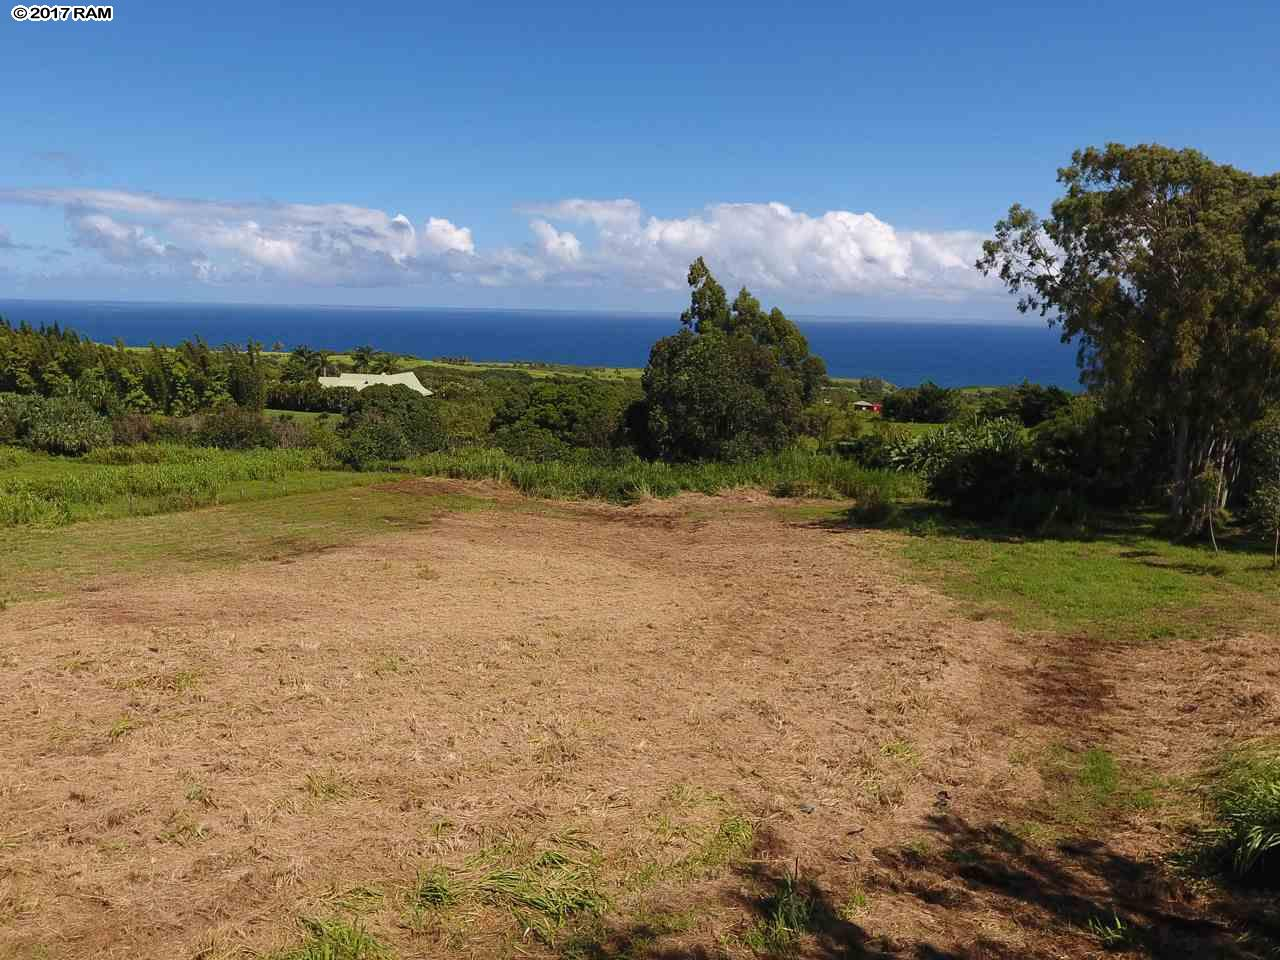 17 Manawai Pl Lot 1  Haiku, Hi 96708 vacant land - photo 1 of 4